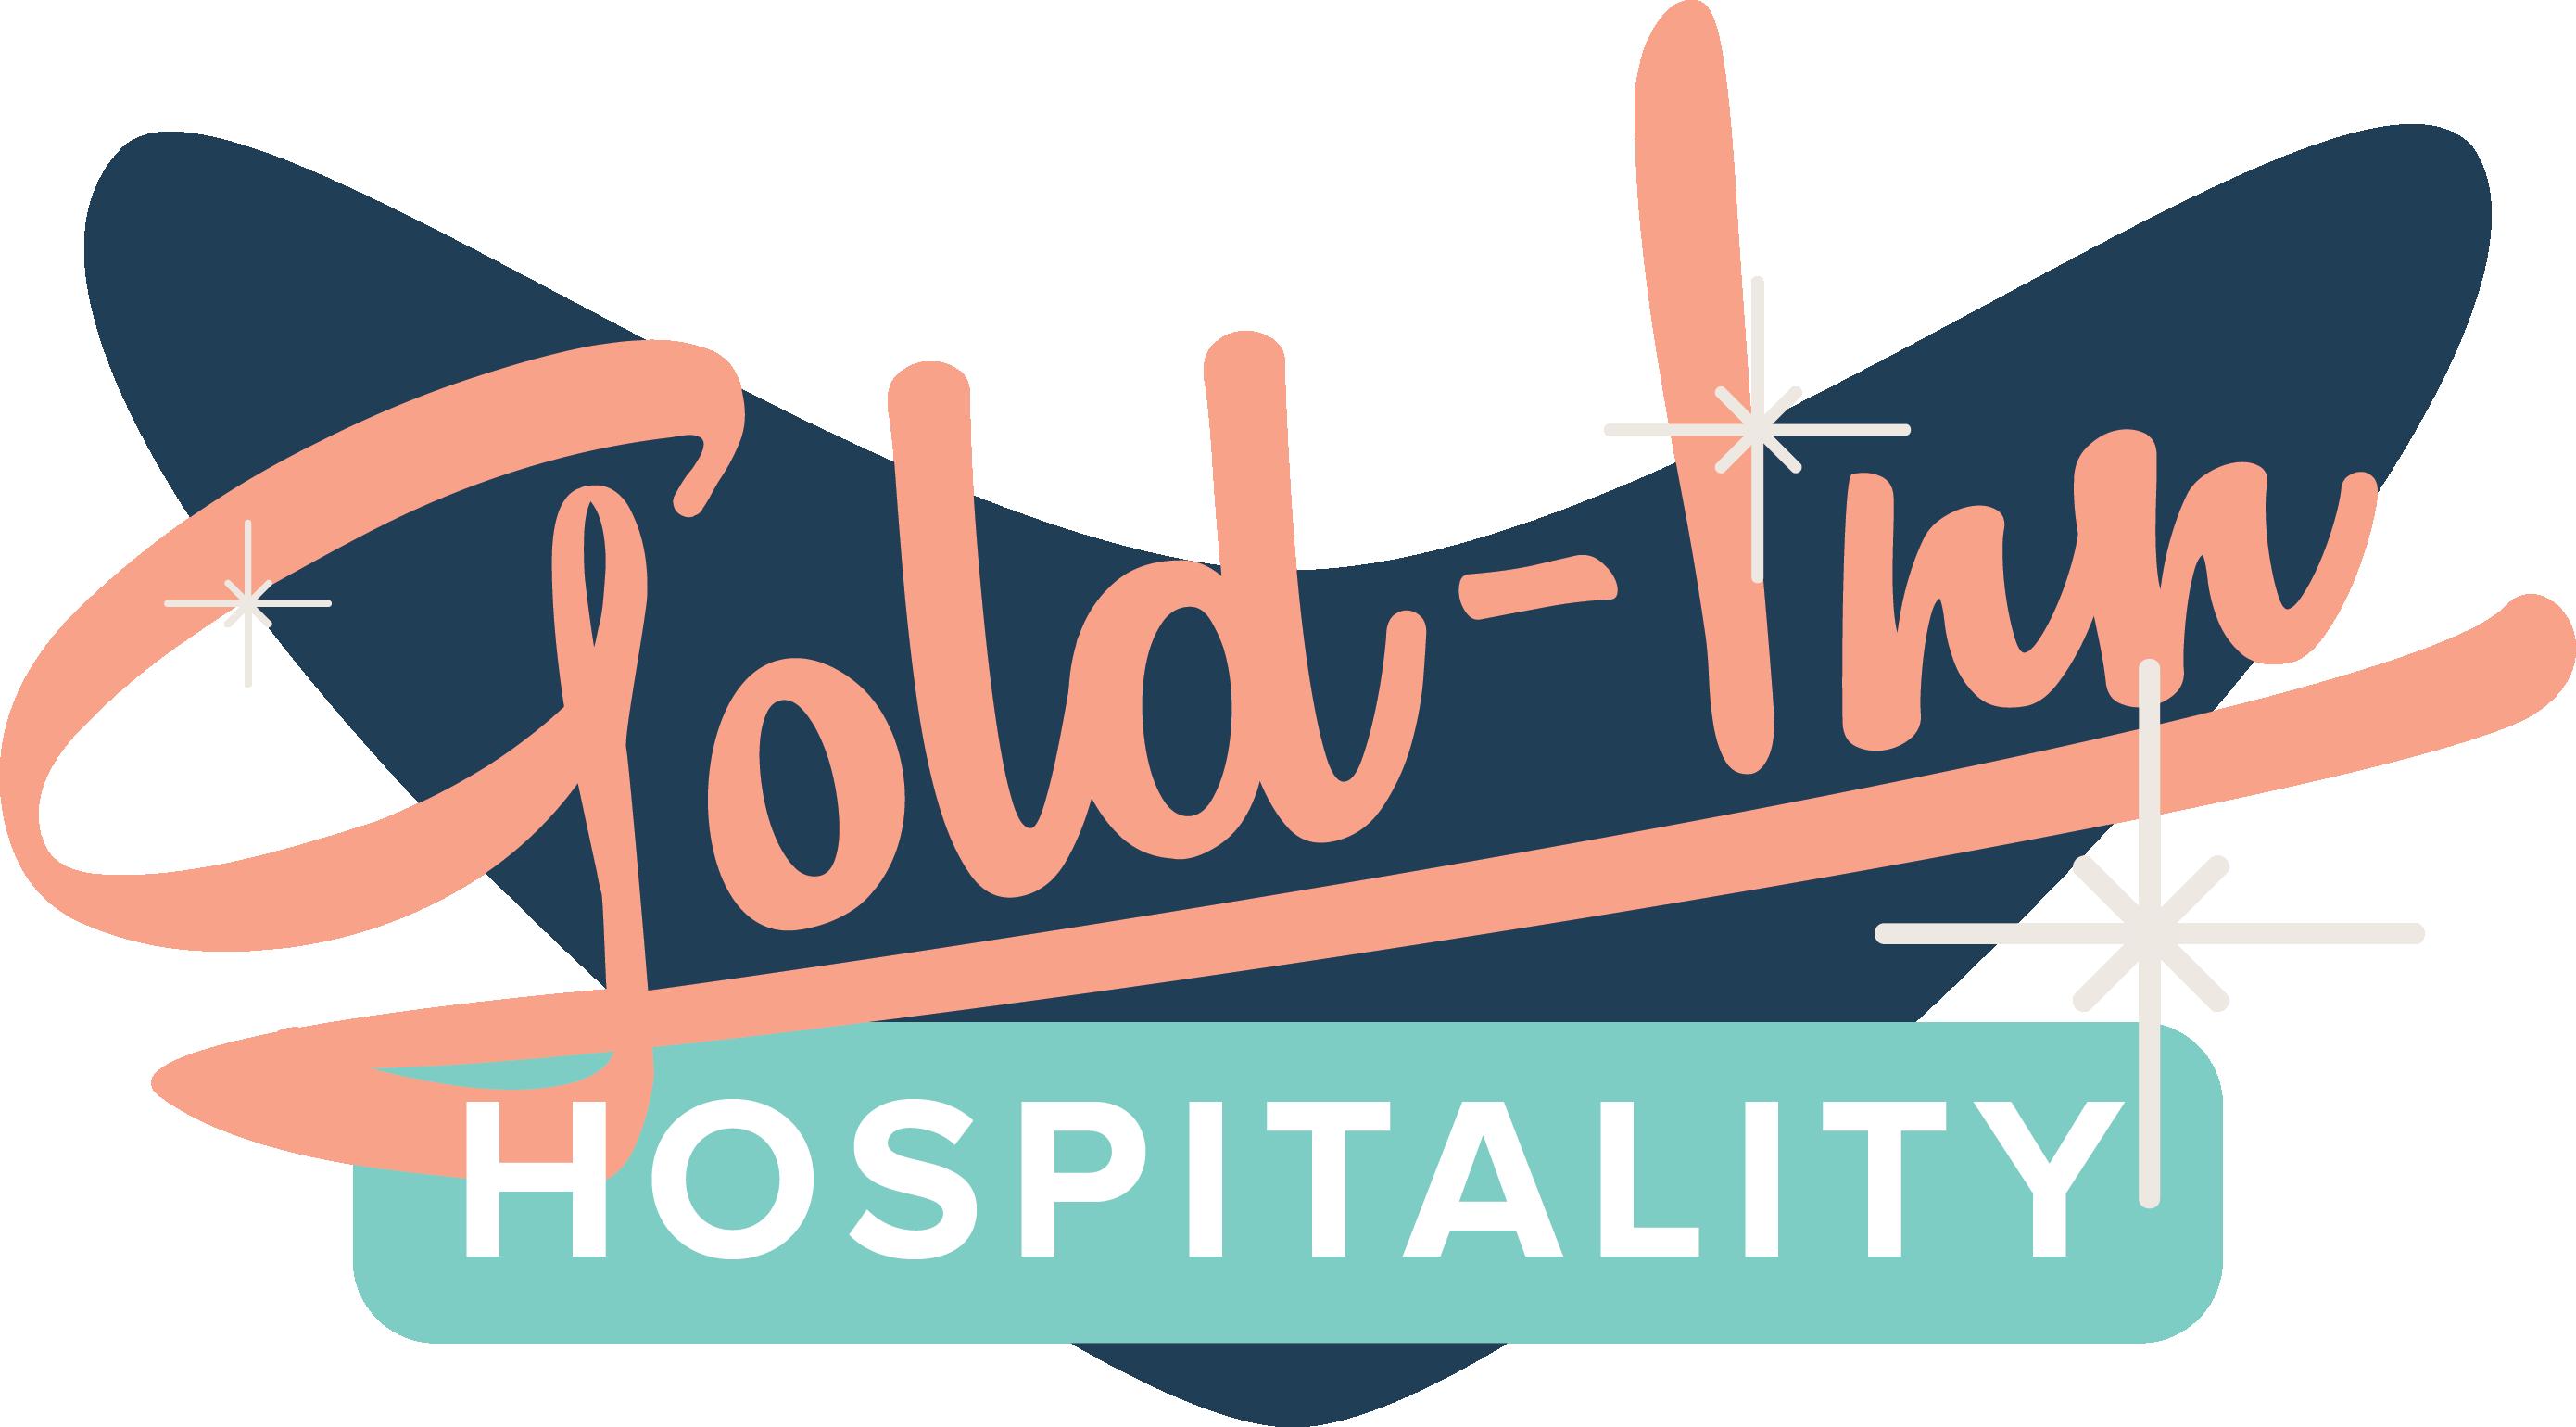 Gold inn . Restaurants clipart hospitality service